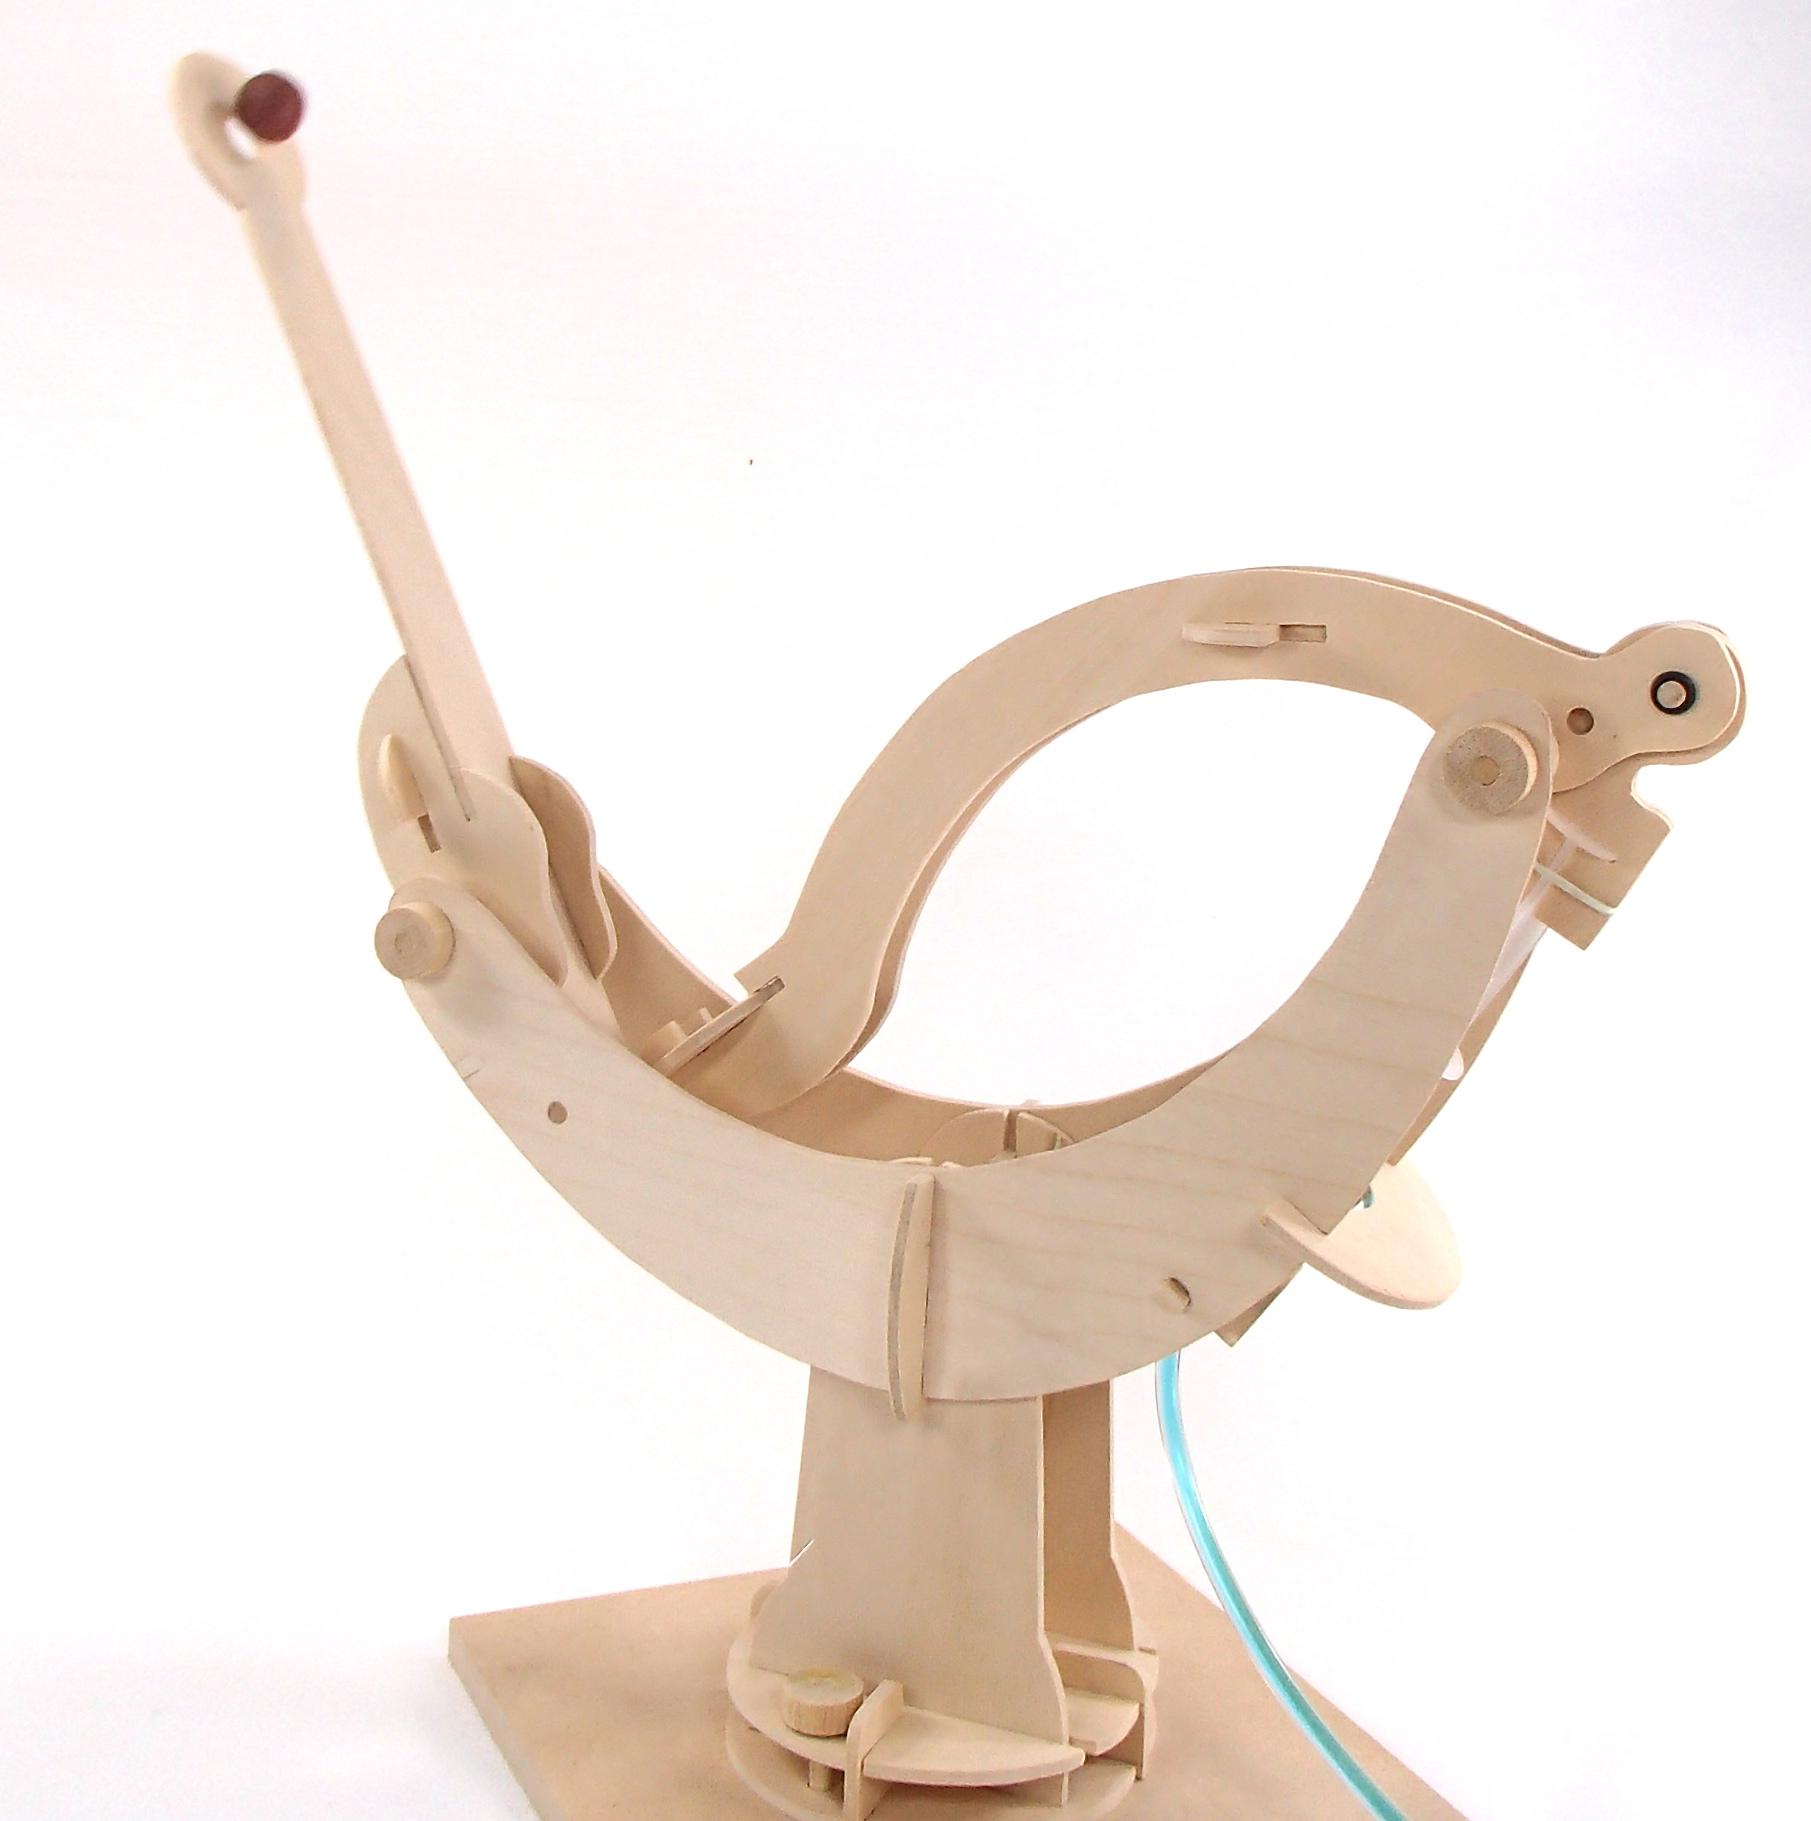 da vinci catapult kit instructions